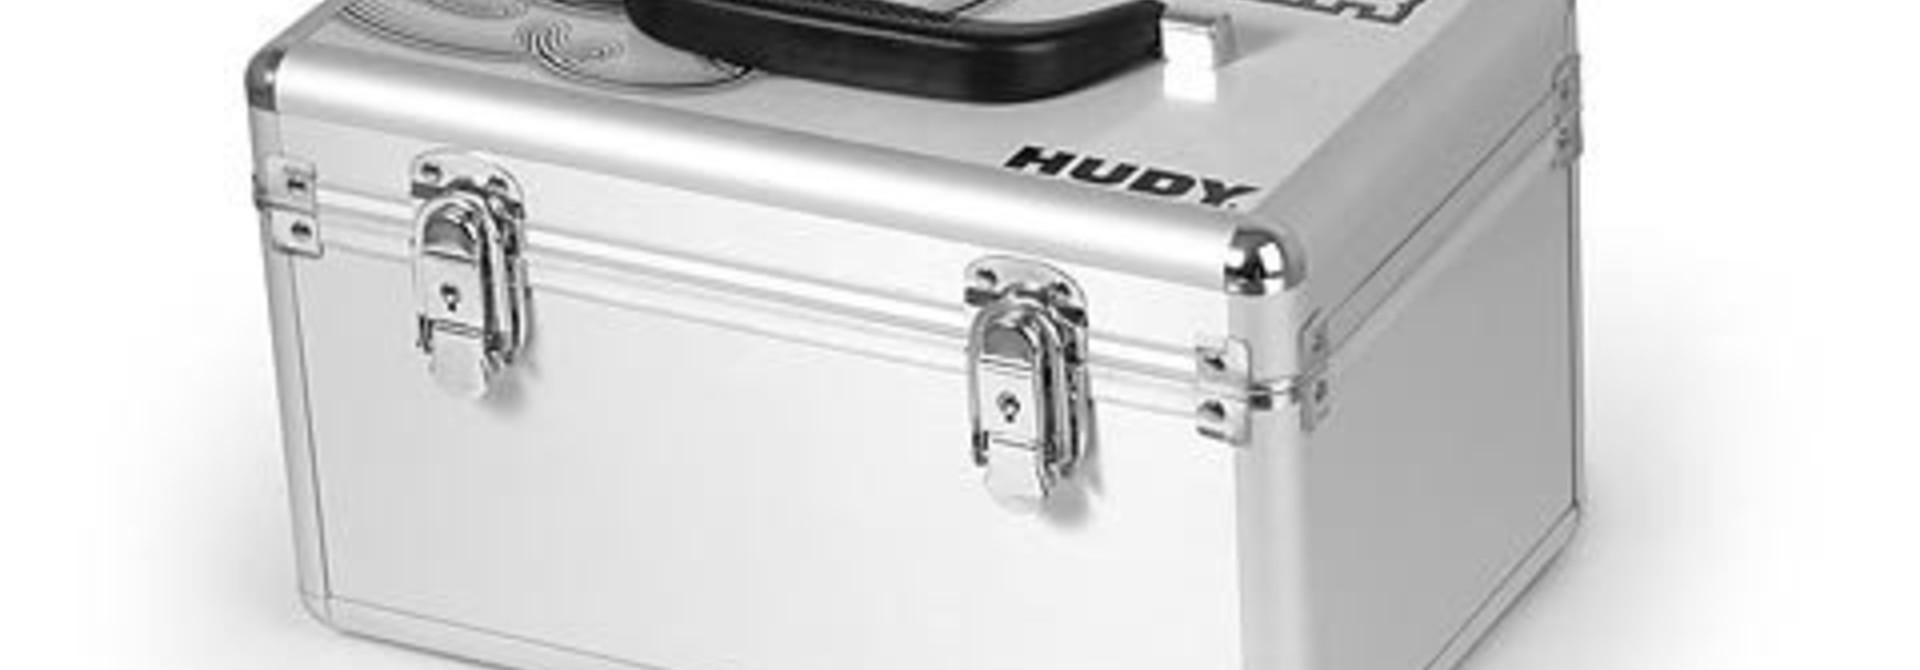 Alu Carry Case For Tire Truer, H102095